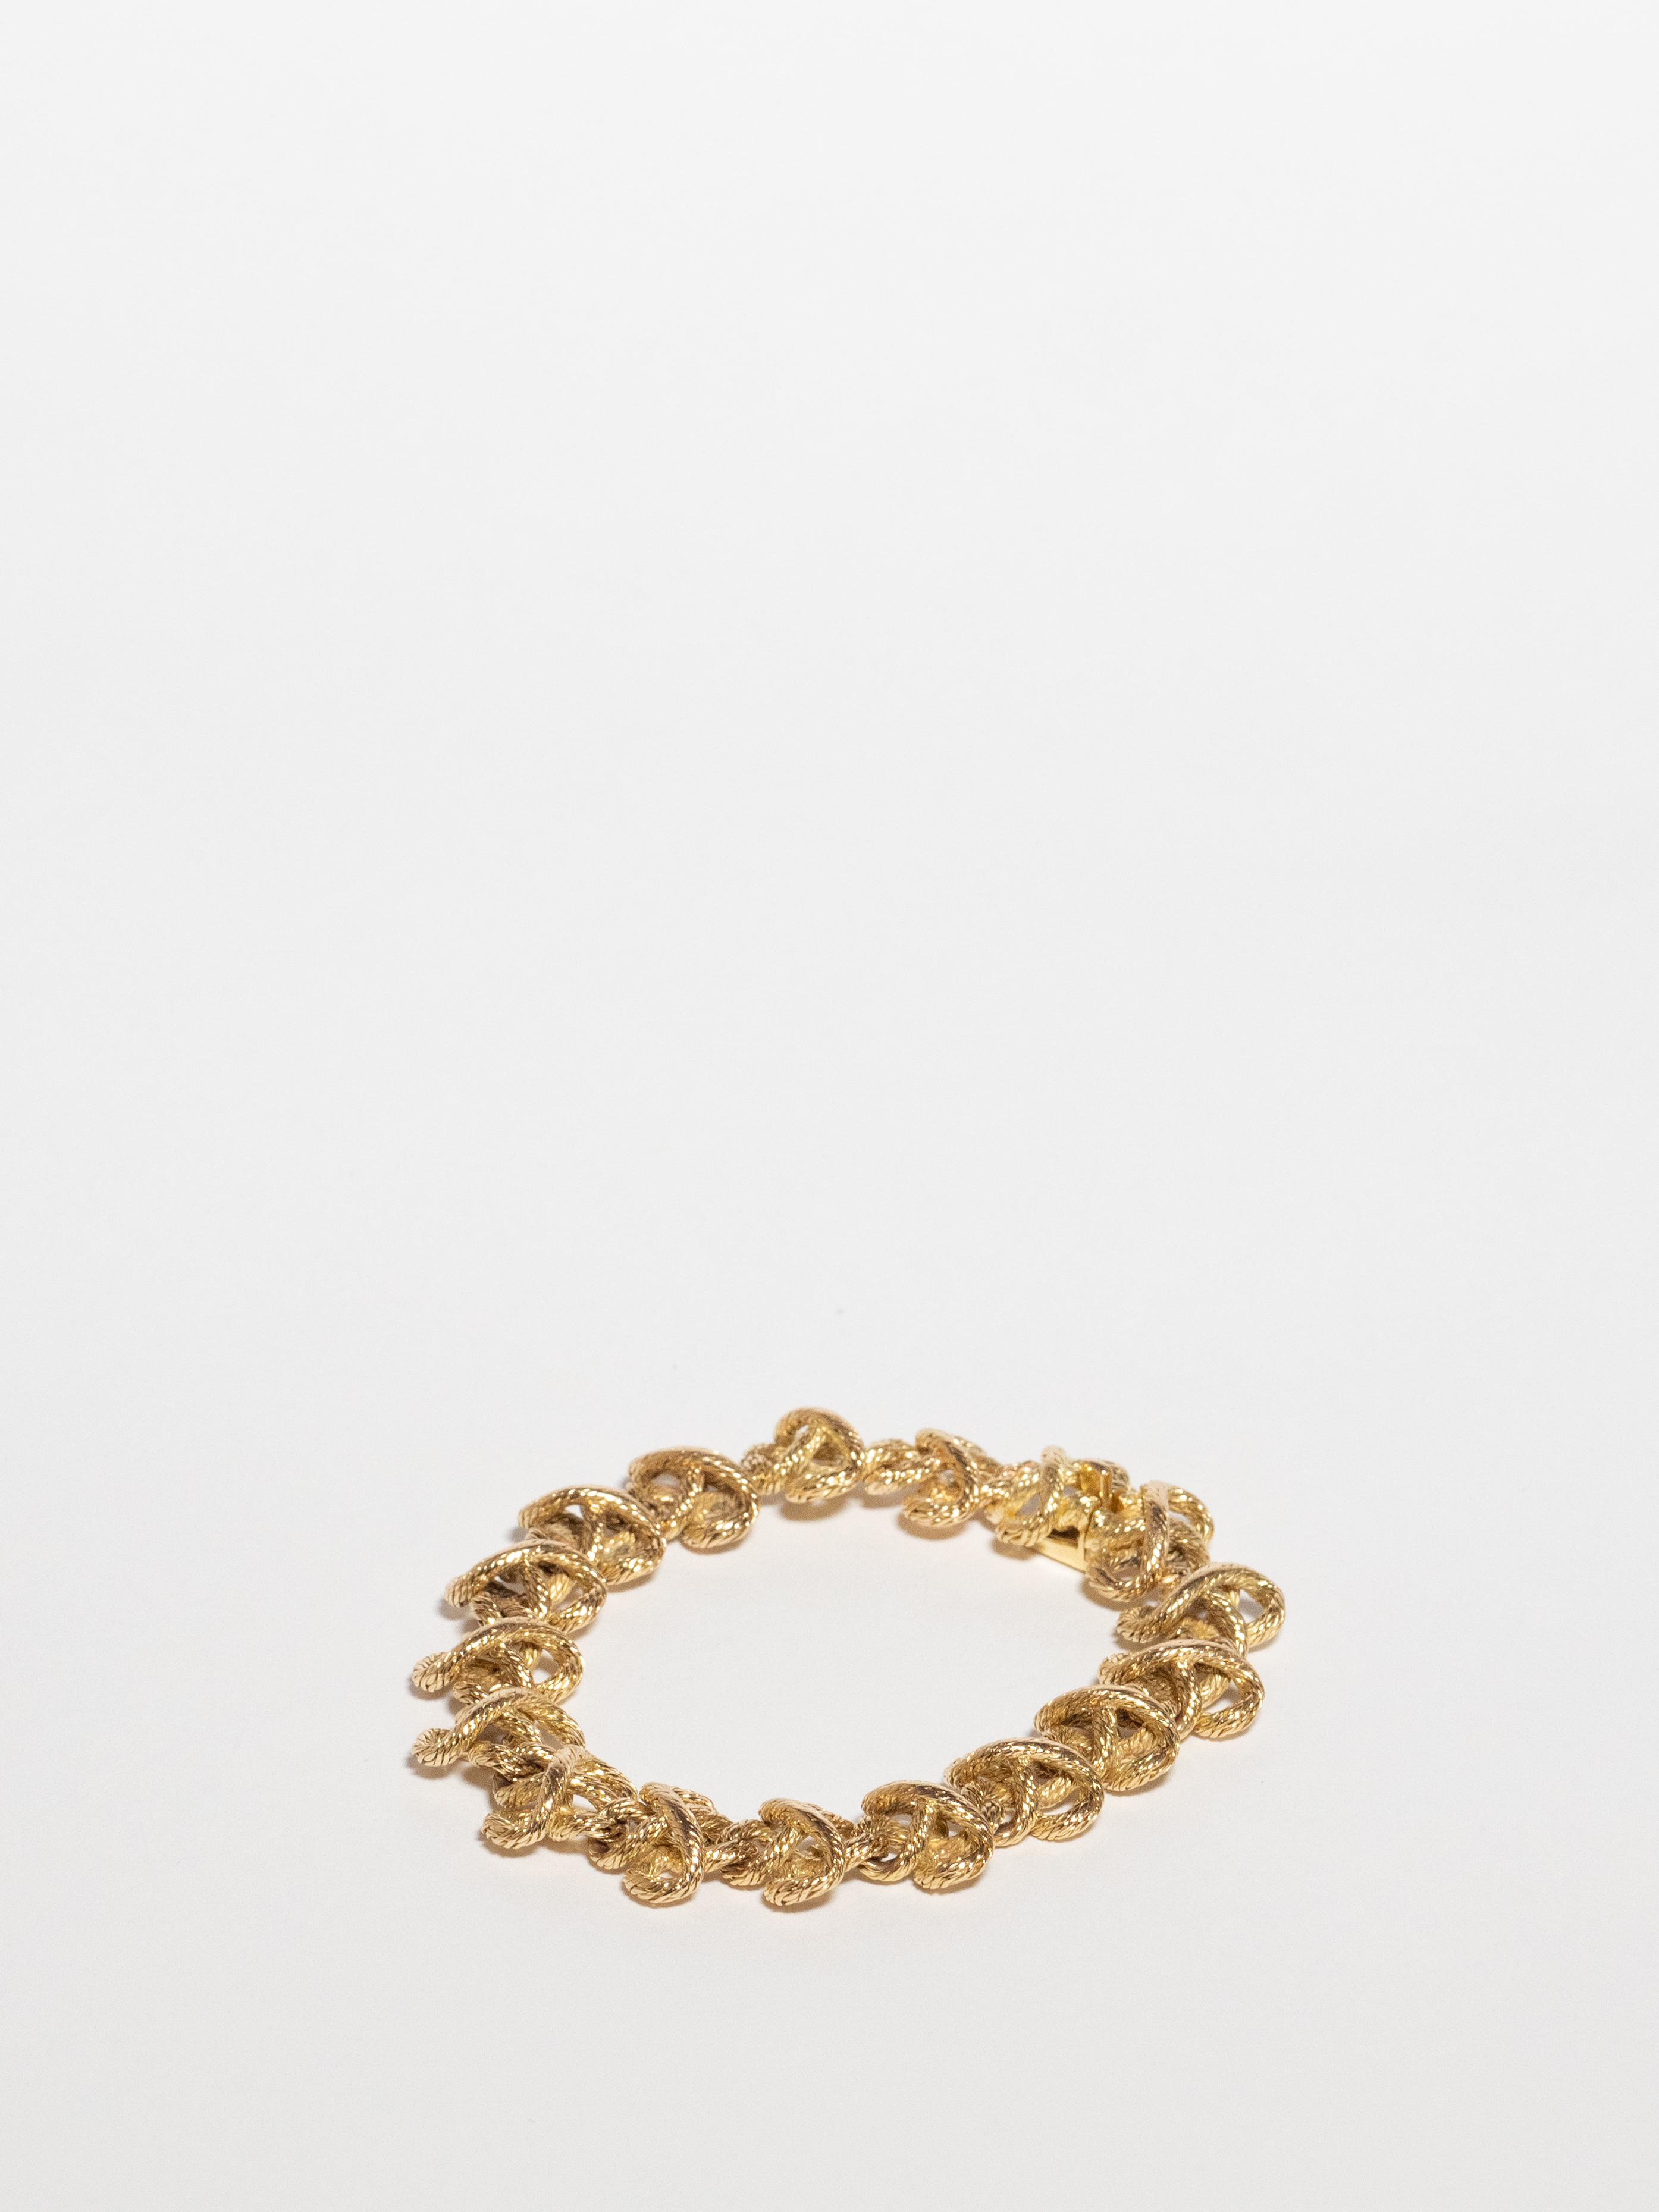 Rope Motif Bracelet / Hermès